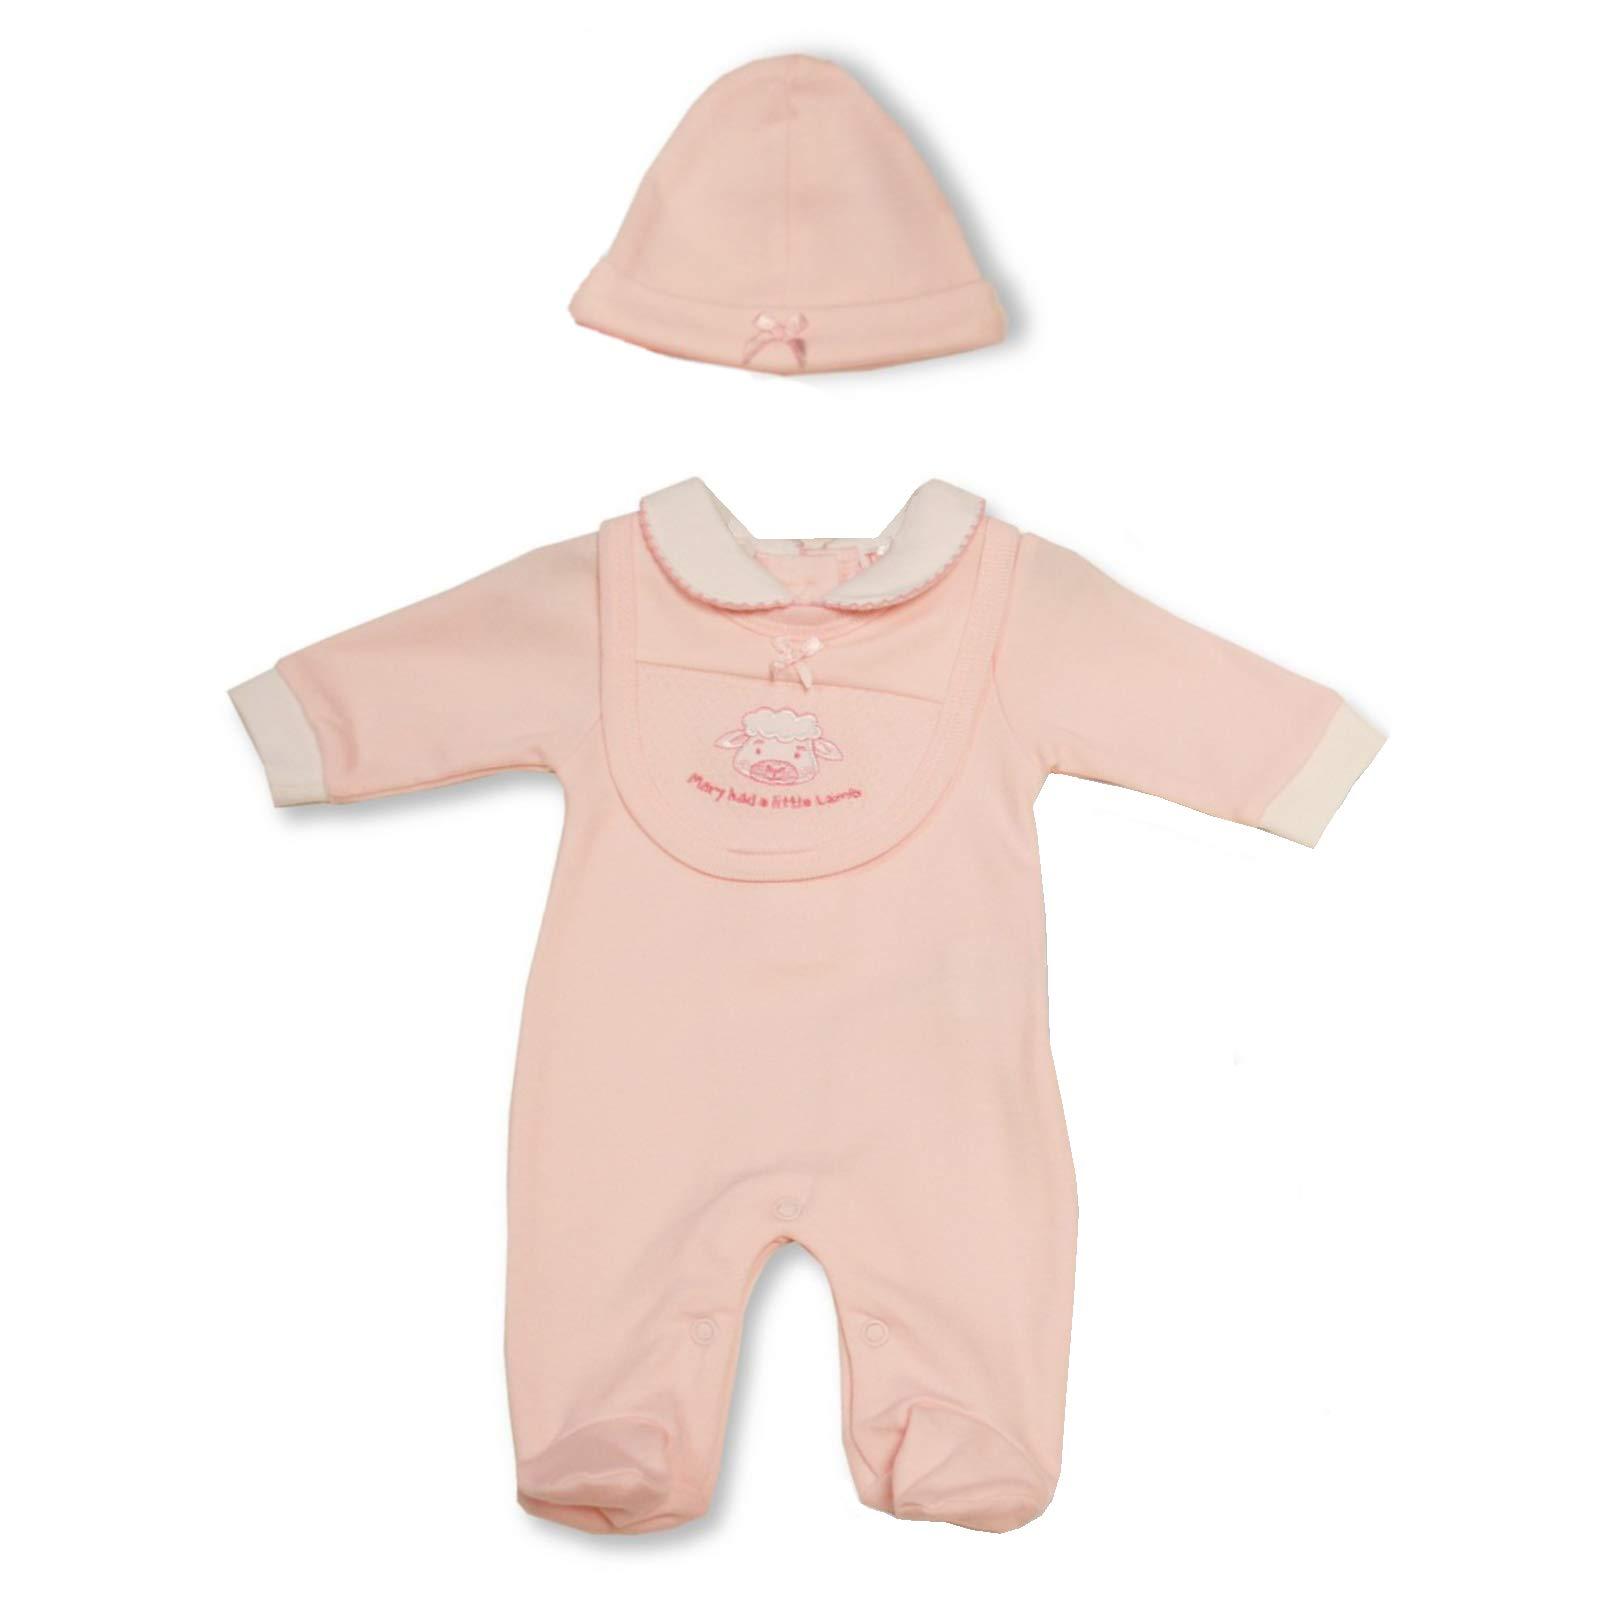 BabyPrem 7 Piece Preemie Baby Clothes Starter Pack 1.5-7.5lb BLUE PREM 3